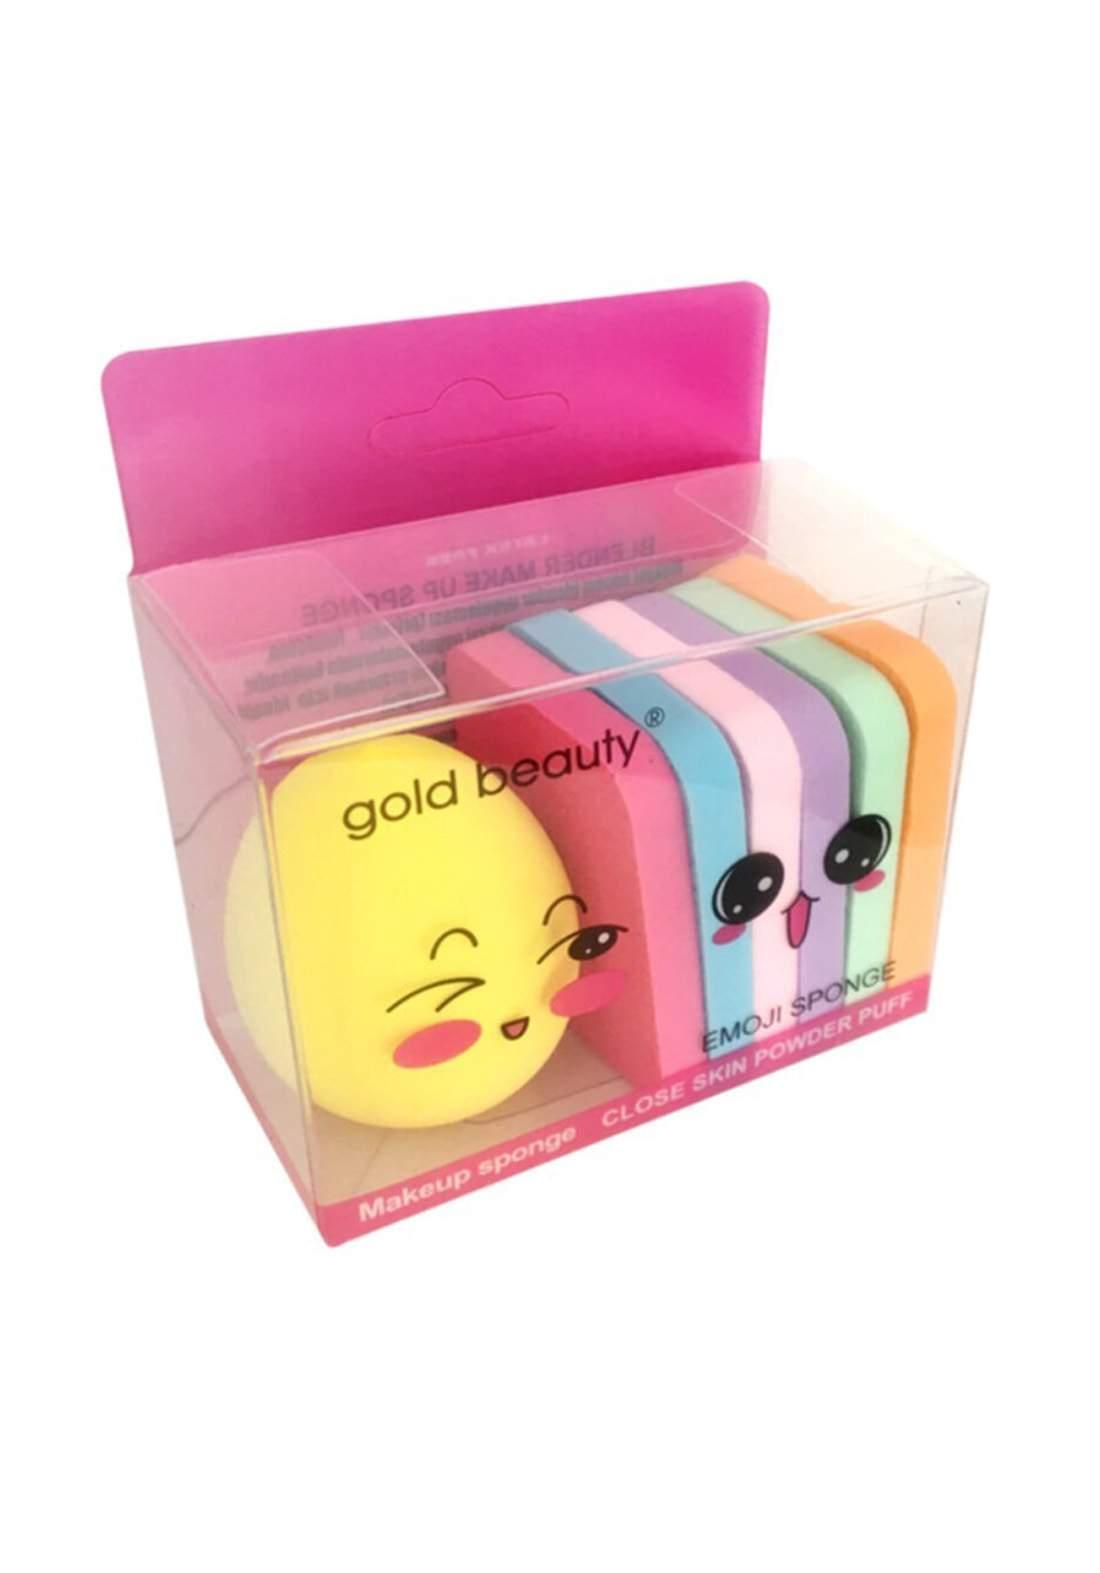 Gold Beauty Makeup Emoji Sponge 7Pcs بيوتي بلندر